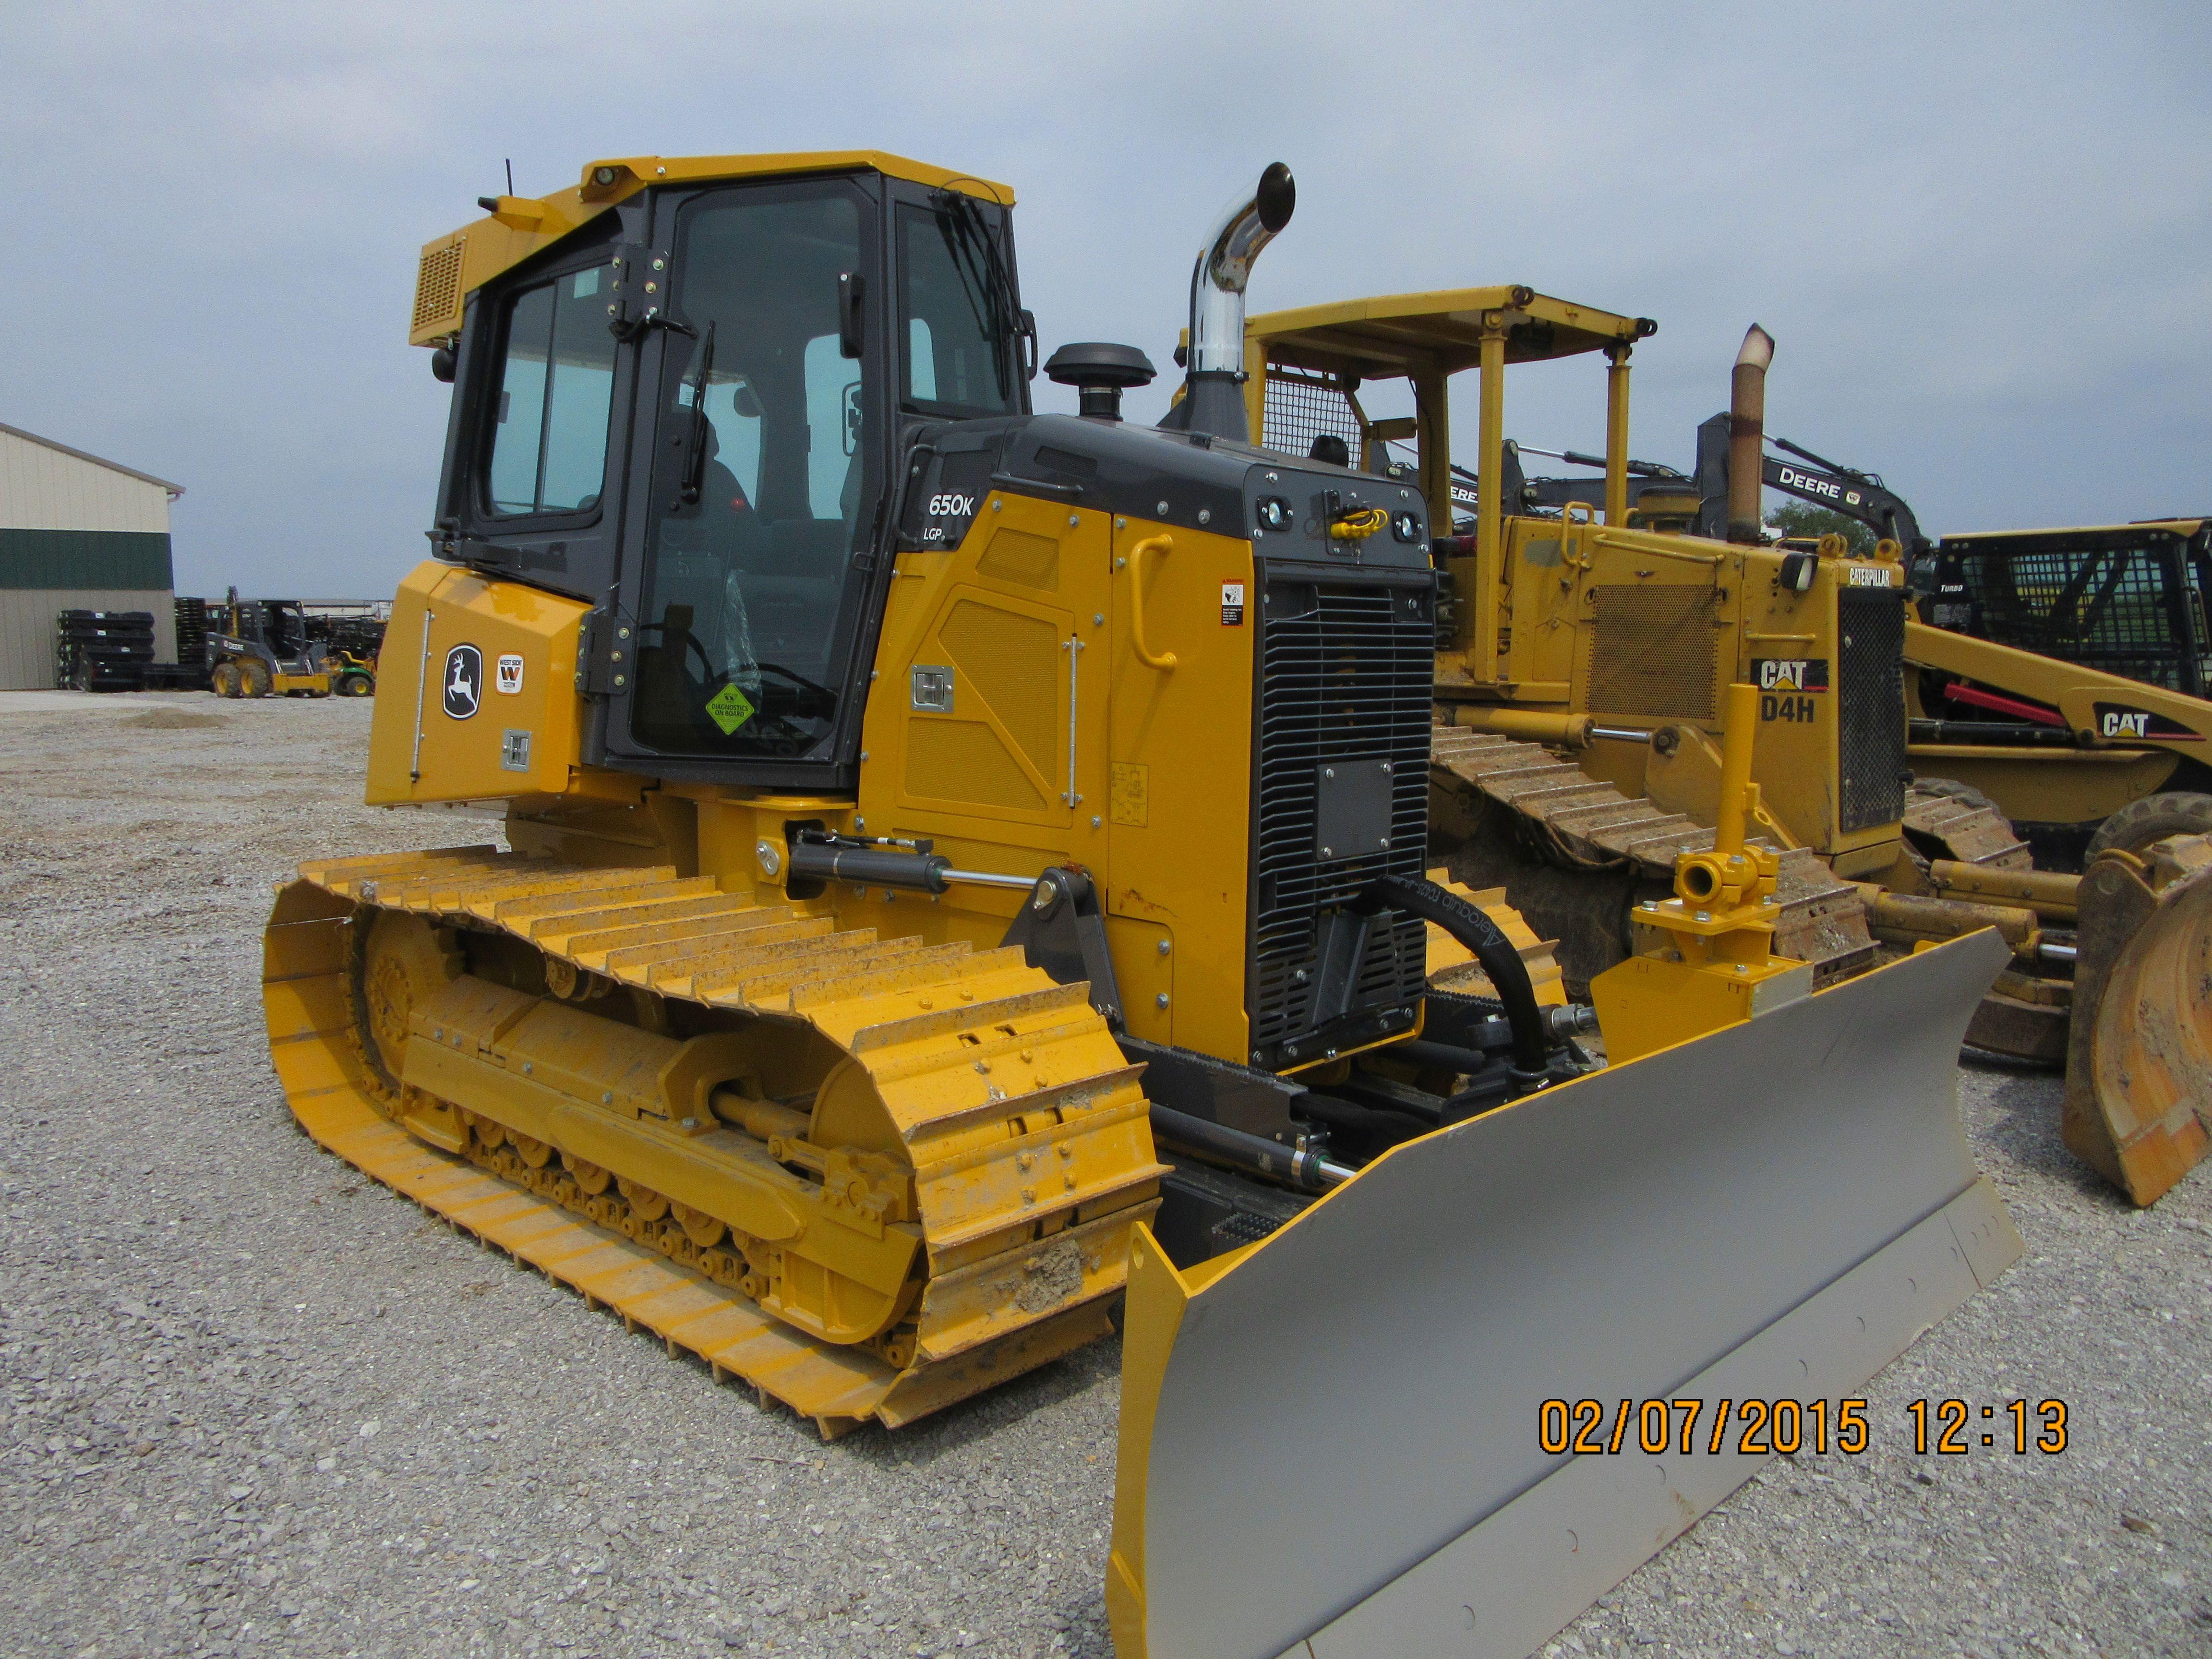 John Deere 650K LGP | JD construction equipment | Heavy